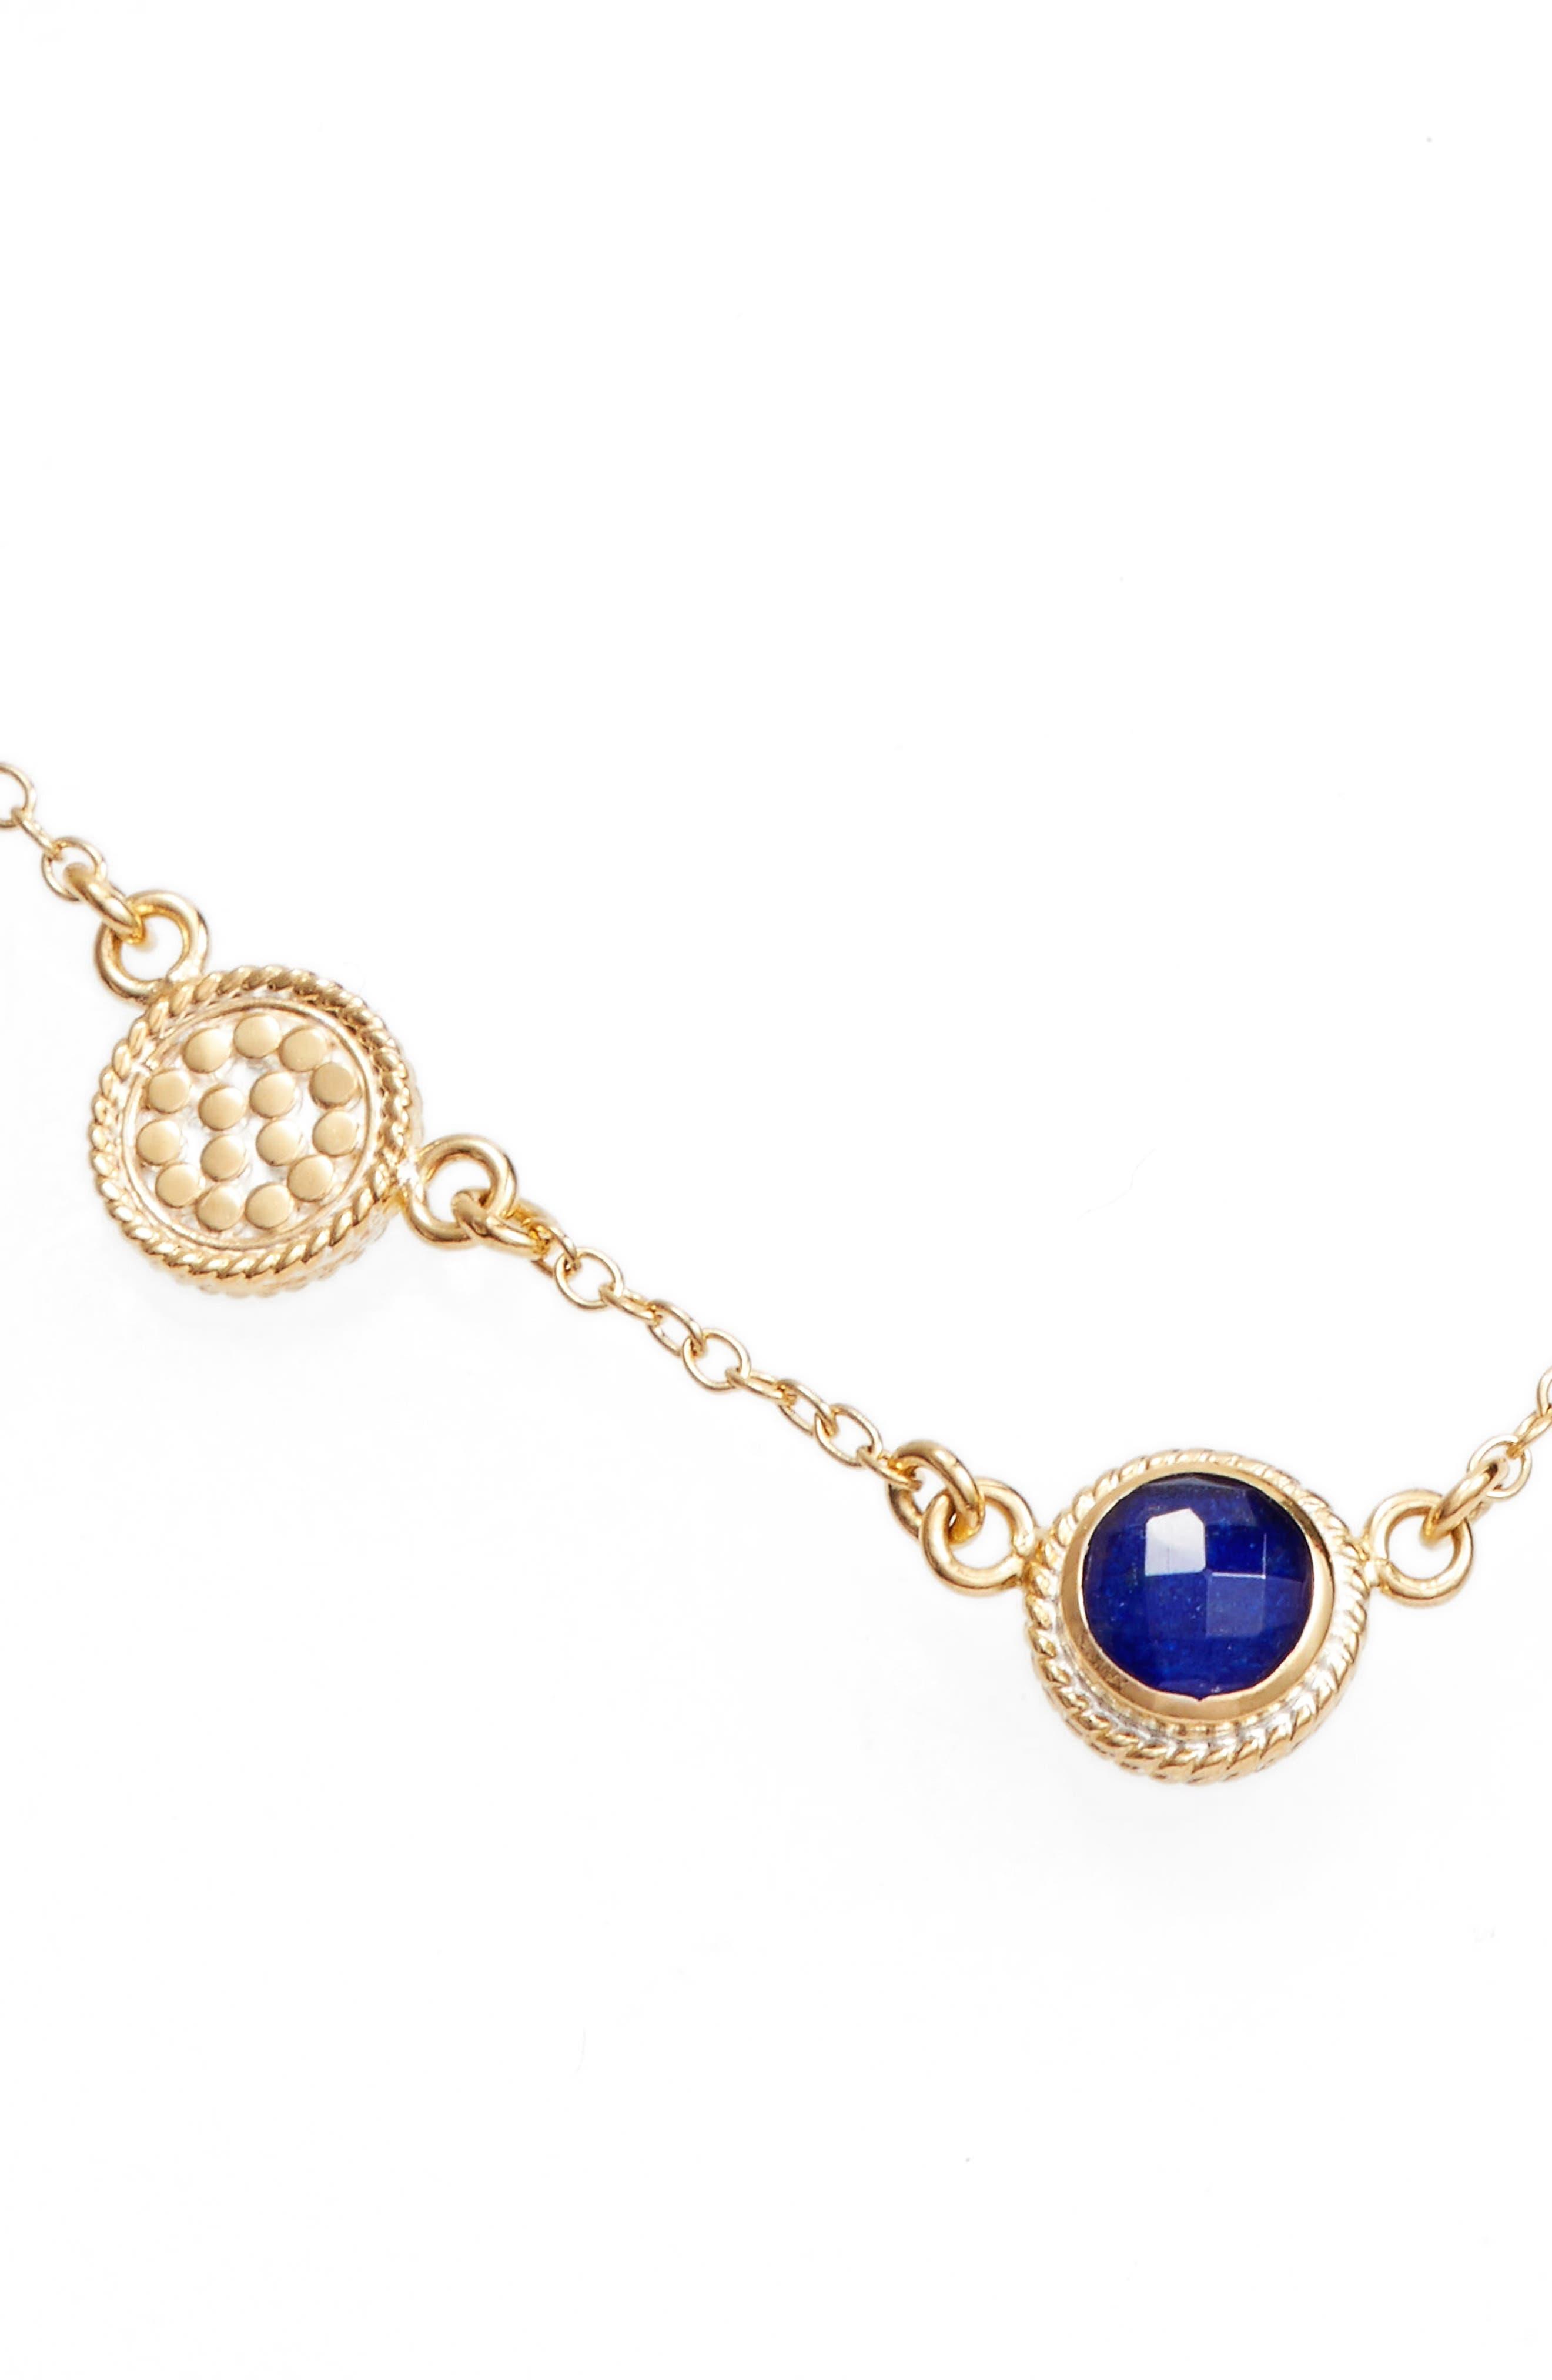 Semiprecious Stone Station Necklace,                         Main,                         color, BLUE LAPIS